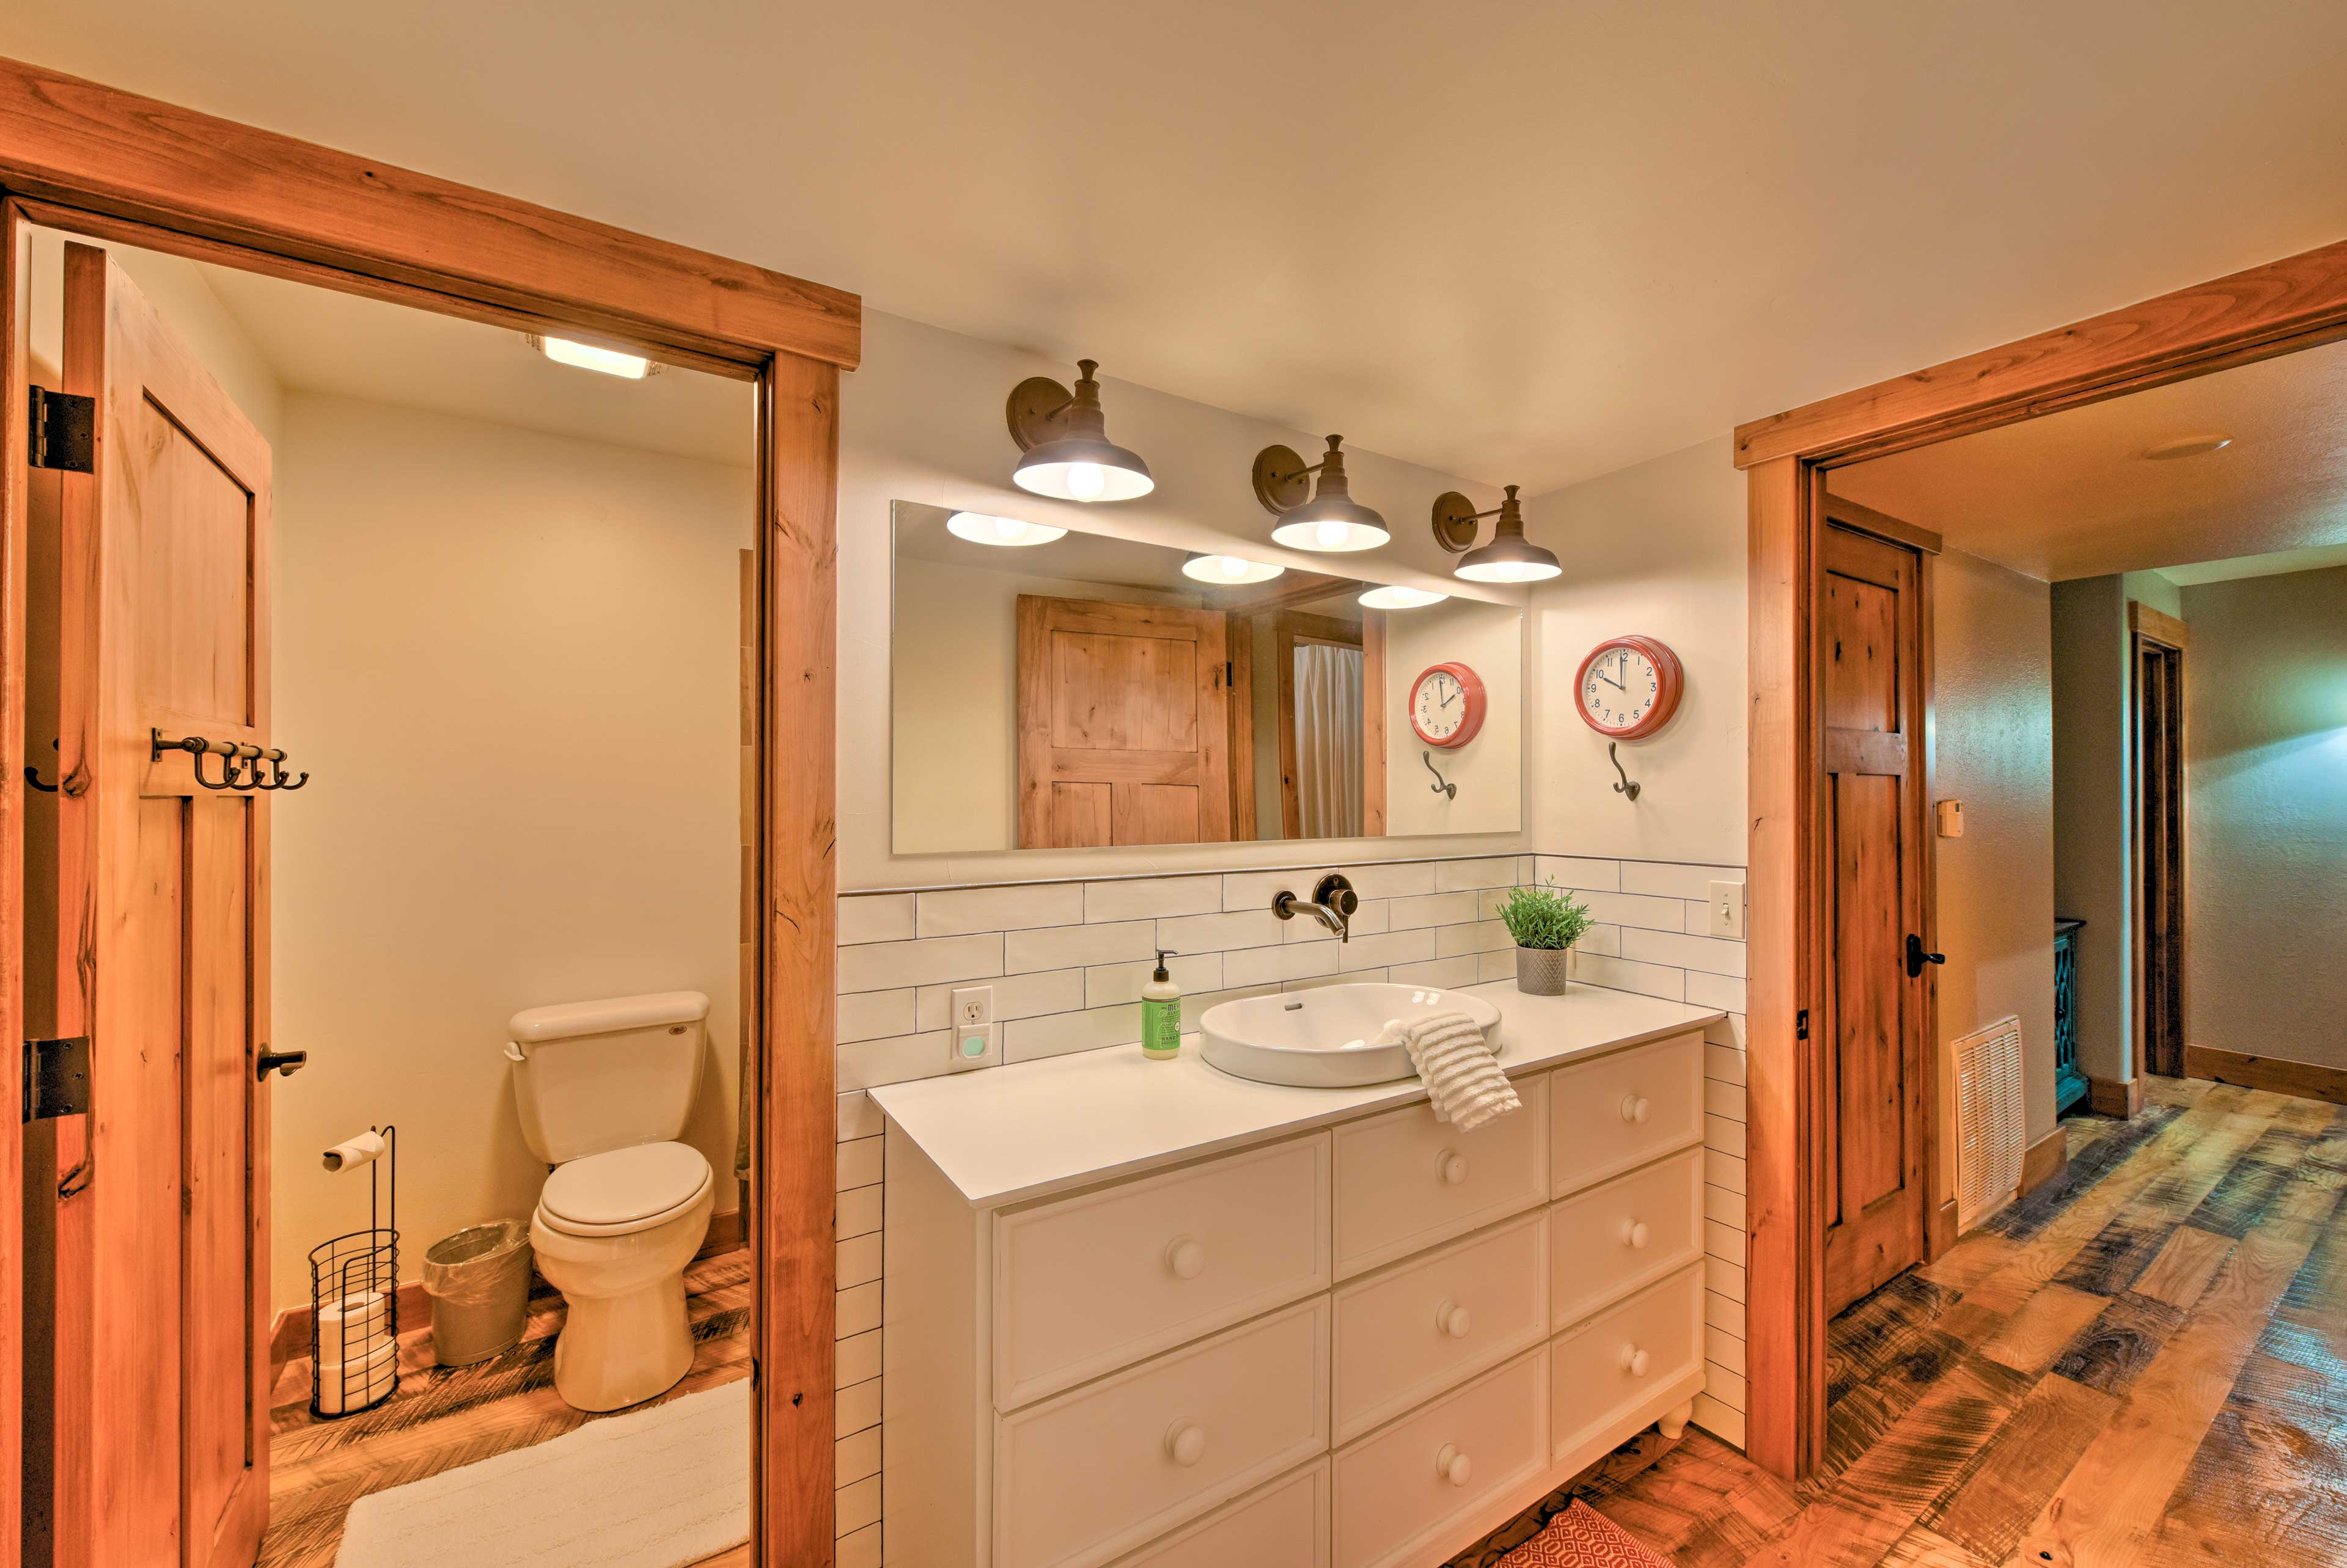 Second Full Bathroom | Jack-and-Jill Bathroom | Modern Finishes